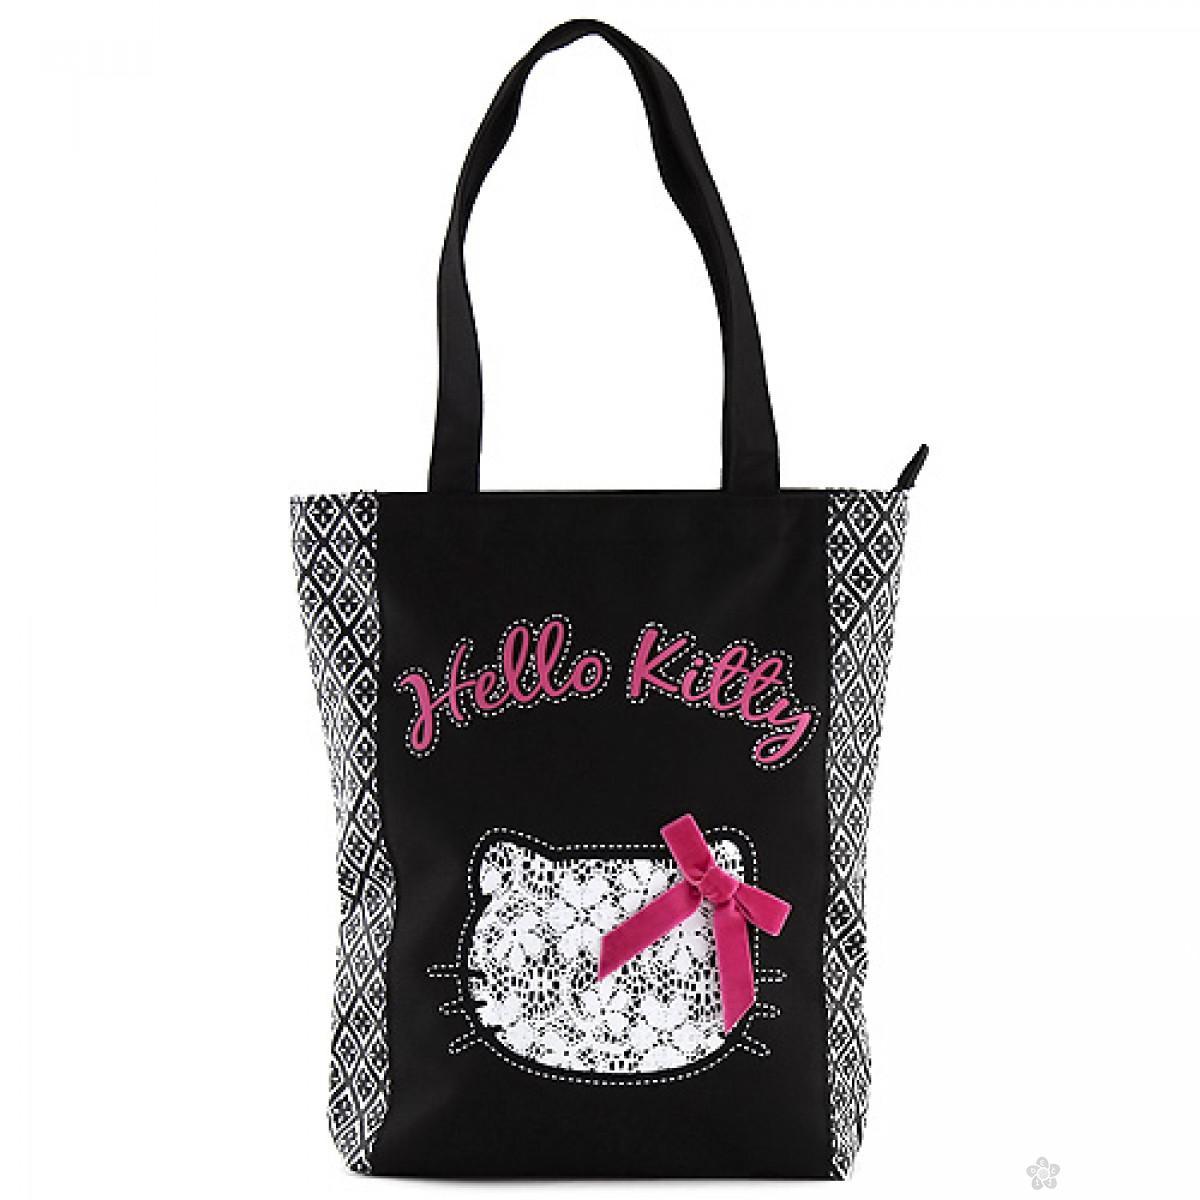 Torba za kupovinu Hello Kitty 23940